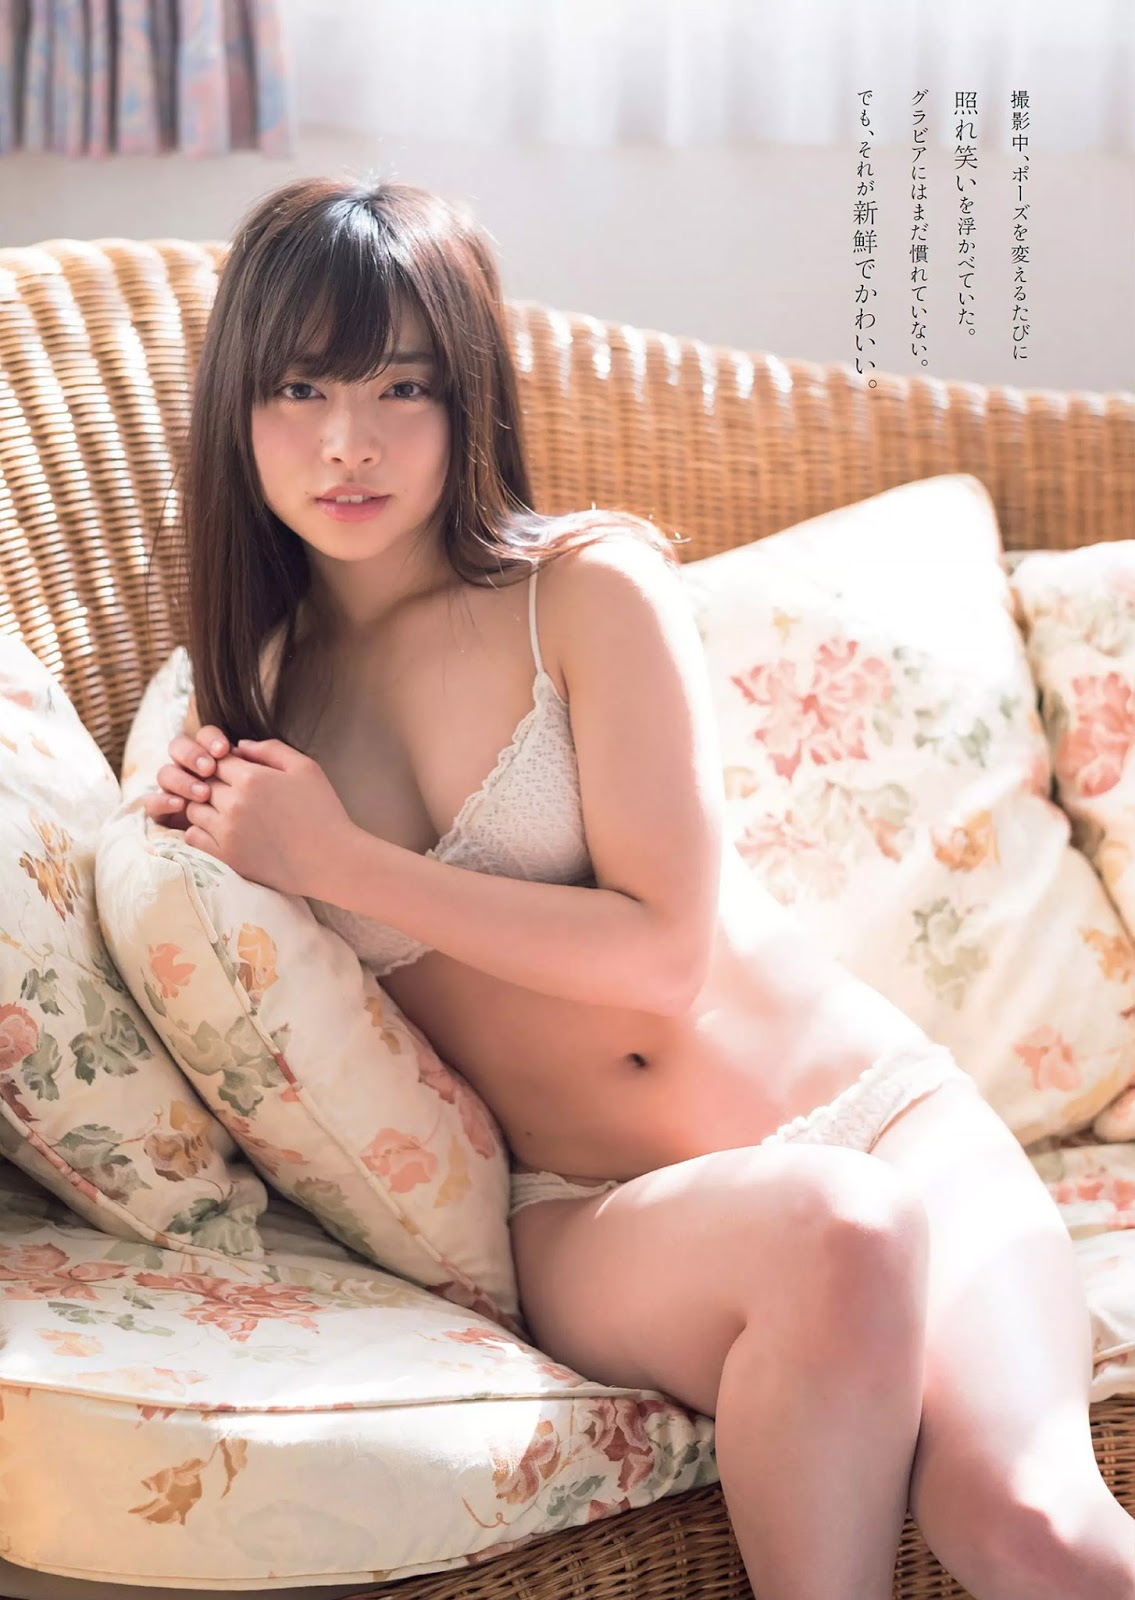 Ito Nene 伊藤寧々, Weekly Playboy 2018 No.15 (週刊プレイボーイ 2018年15号)